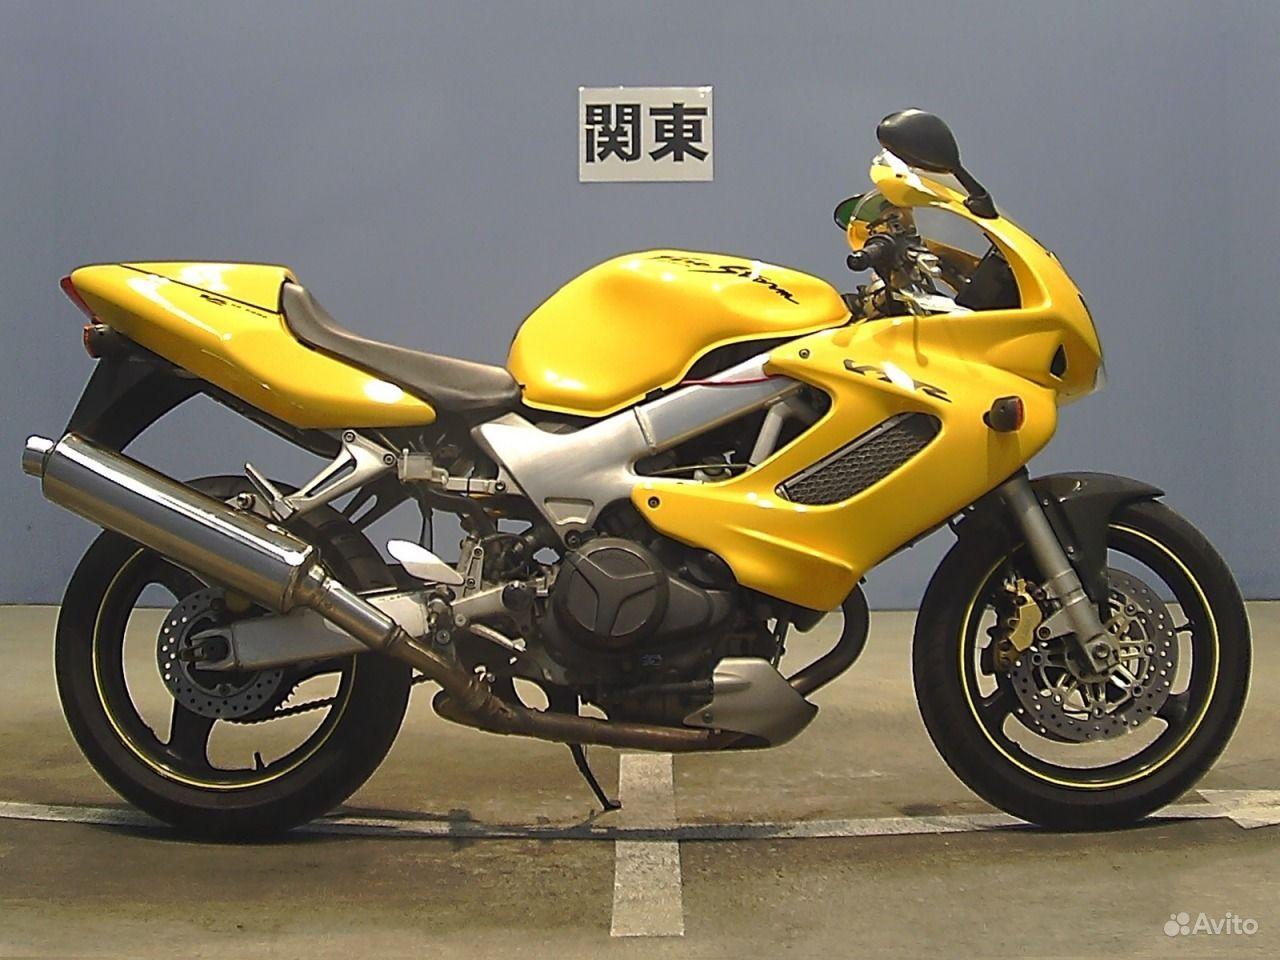 Фото мотоцикла homa f5 14 фотография